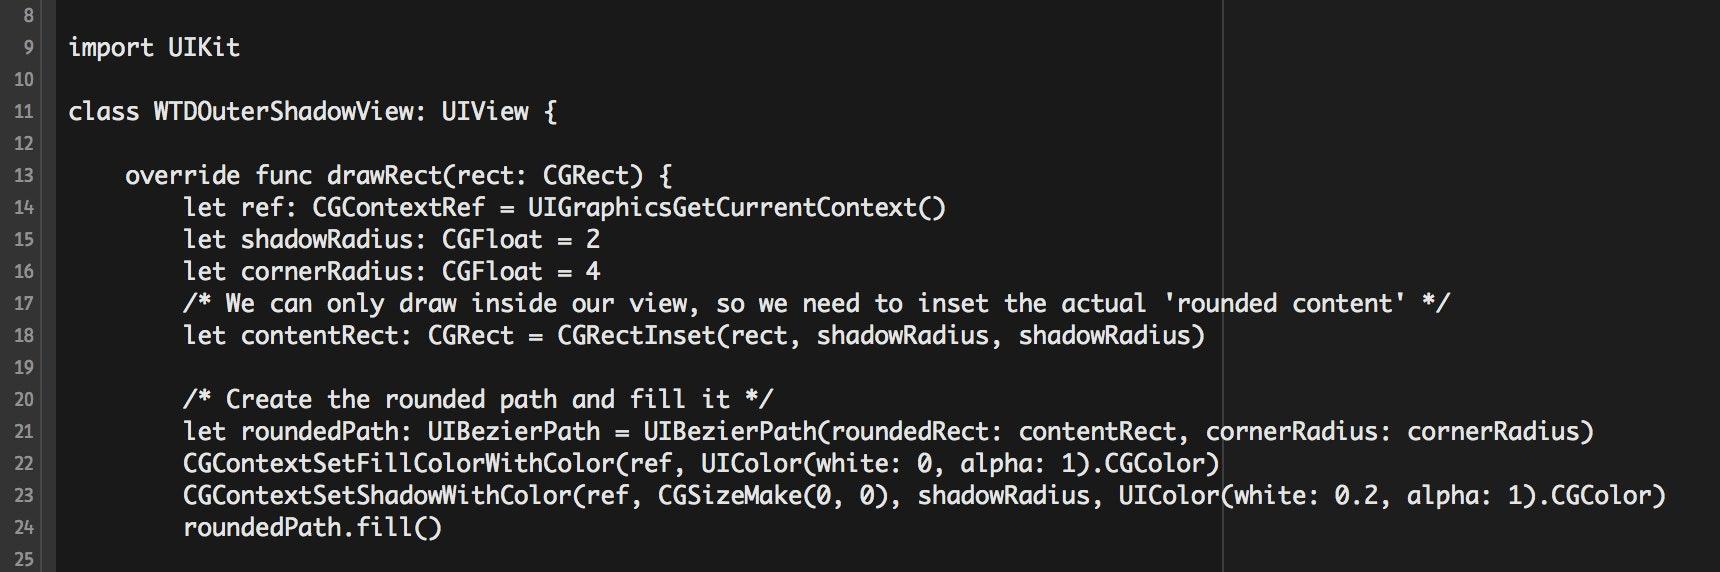 WTDOuterShadowView_swift.jpg